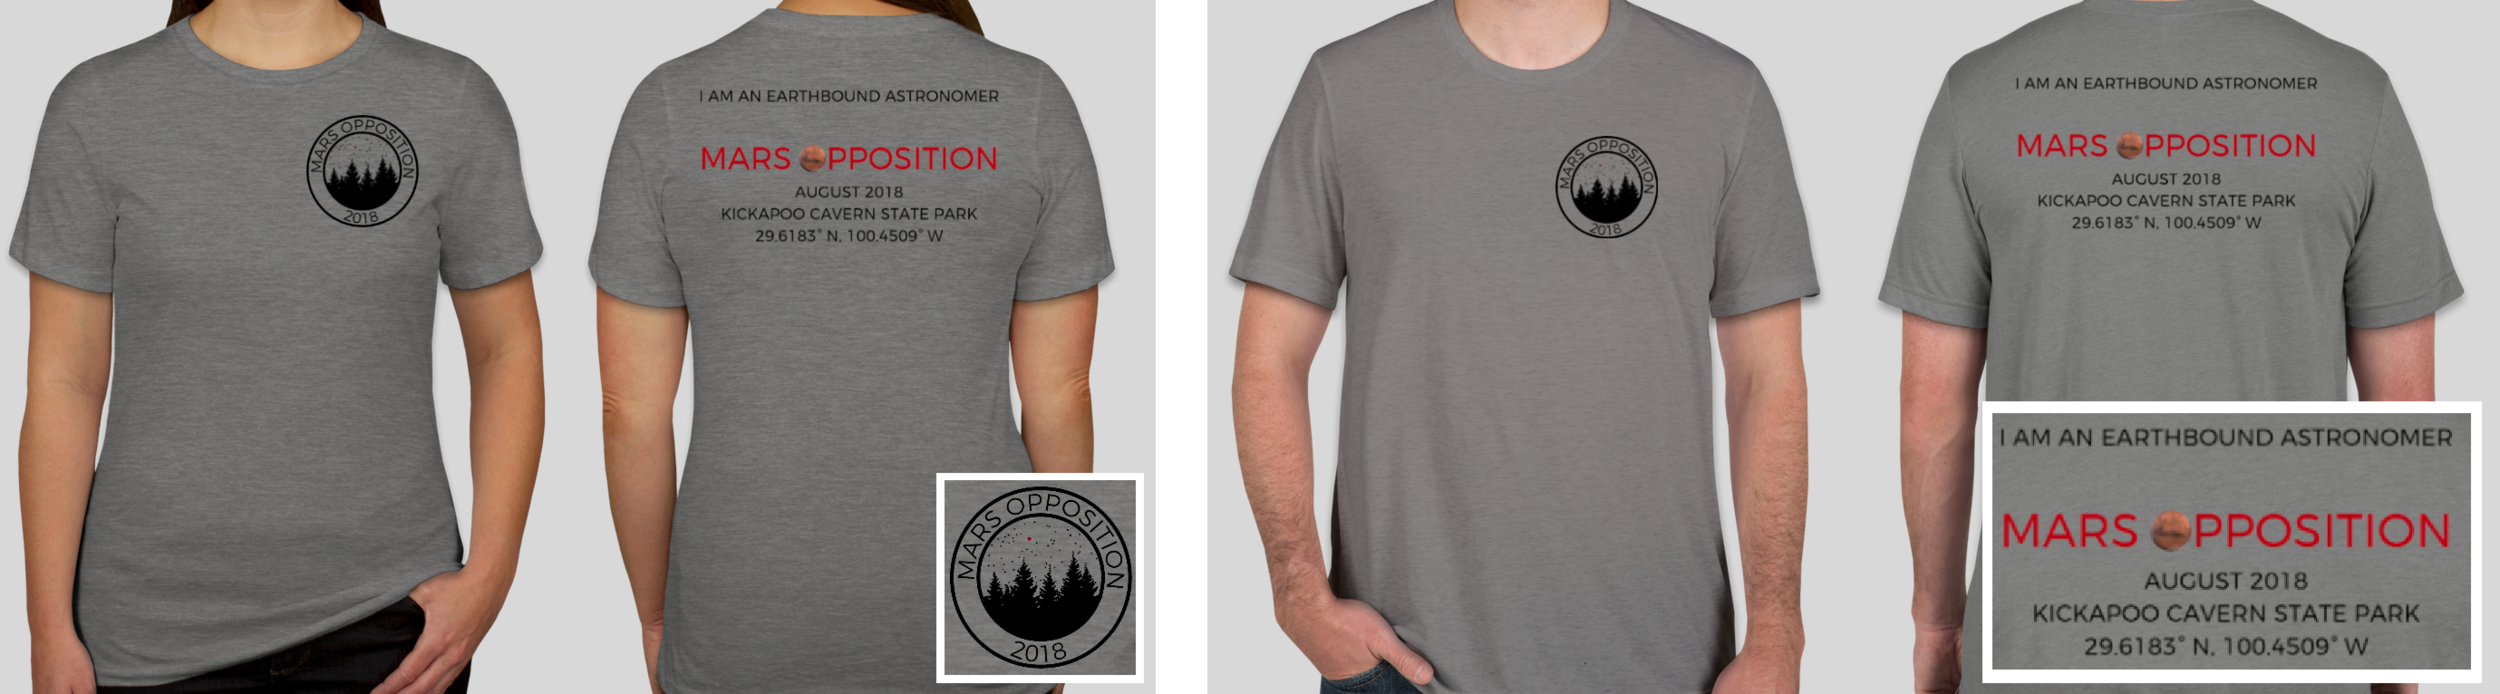 Shirt Image for Website.png